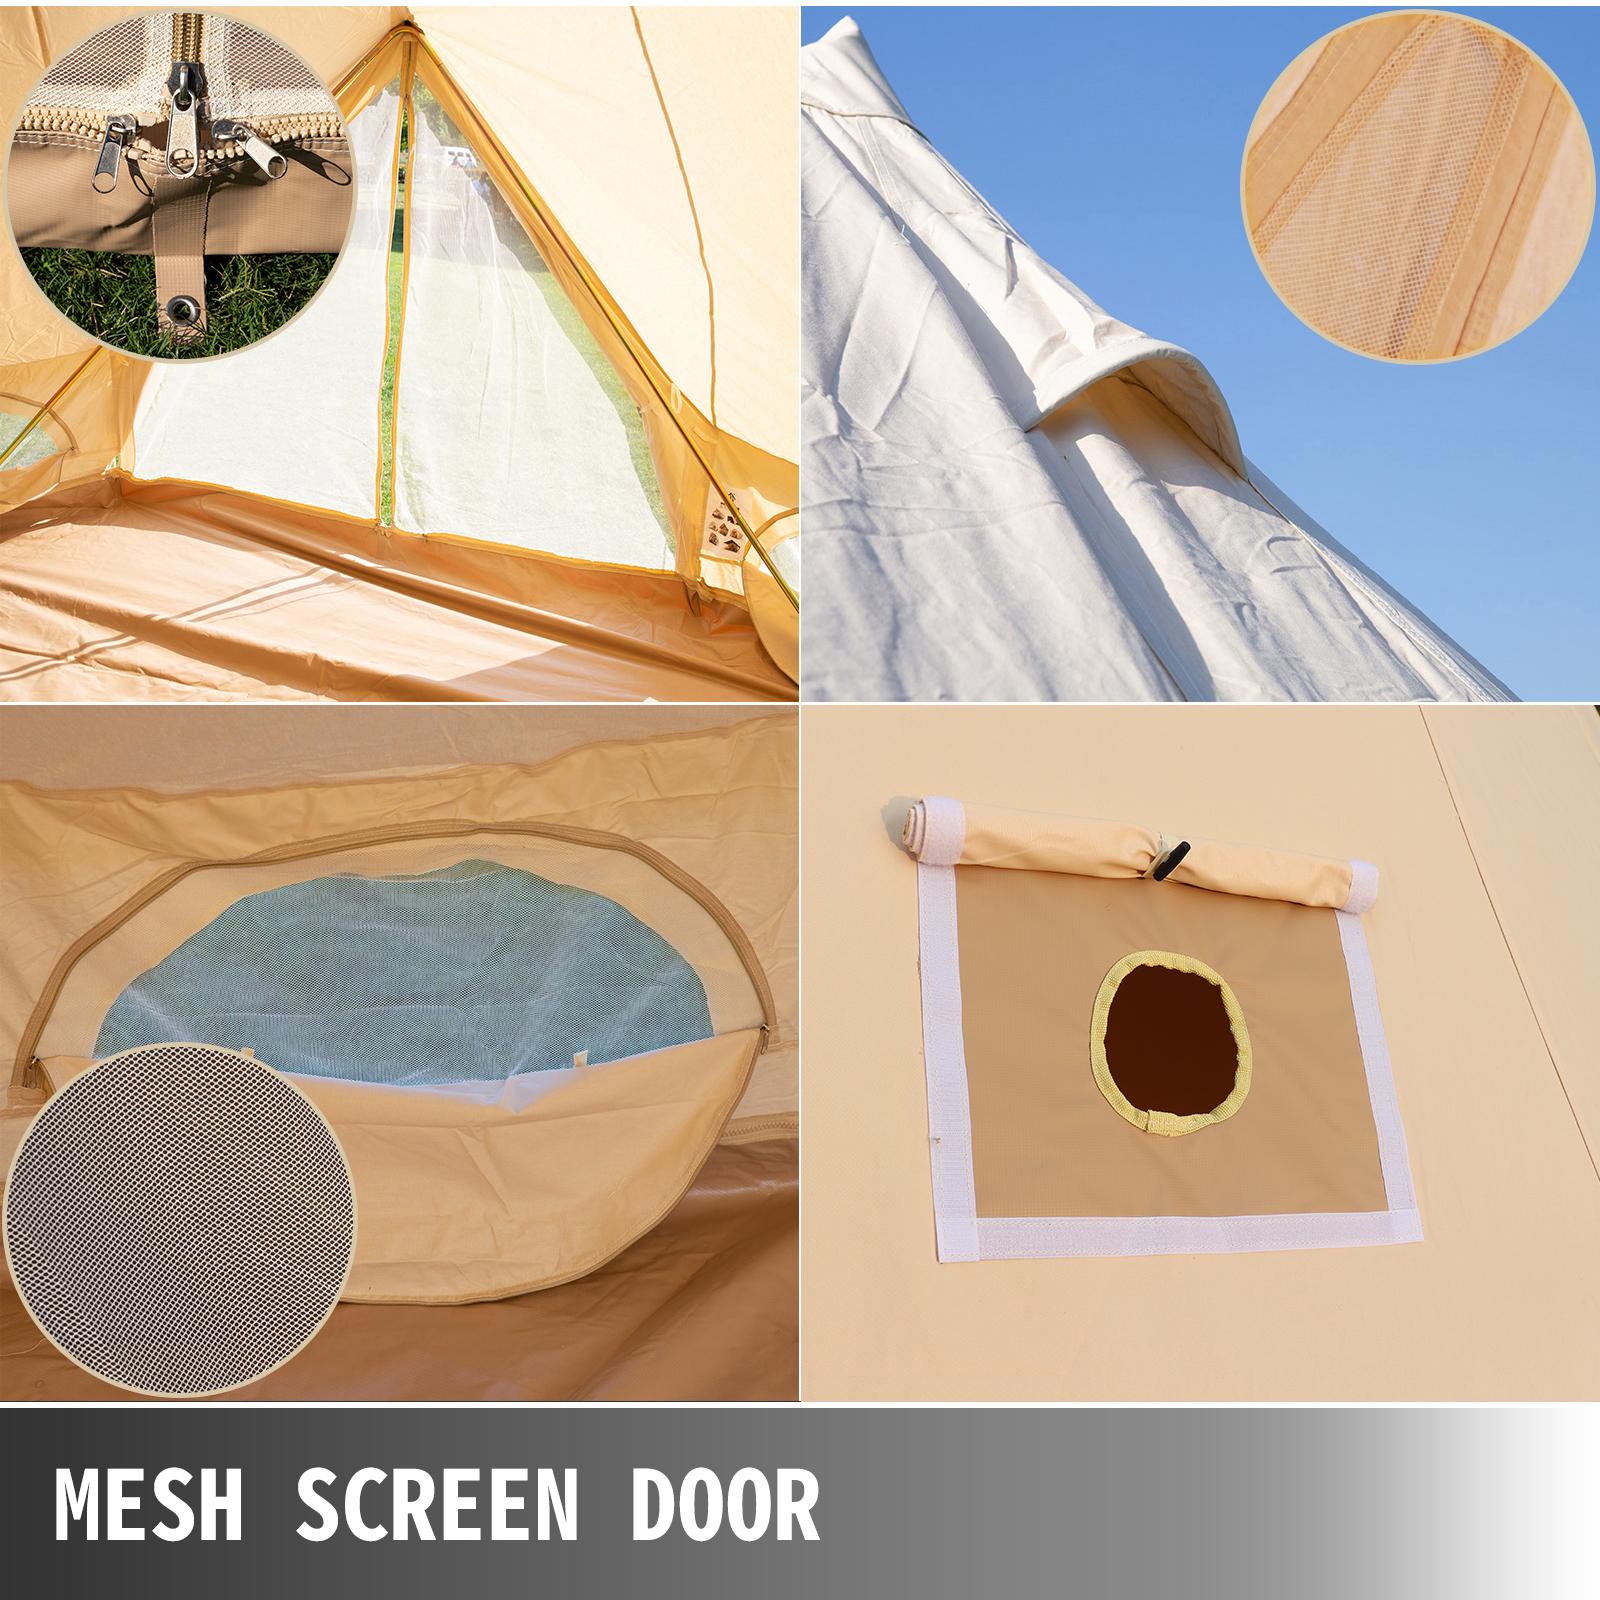 4-Season-Bell-Tent-3-4-5-6M-Waterproof-Cotton-Canvas-Glamping-Camping-Beach-US thumbnail 27